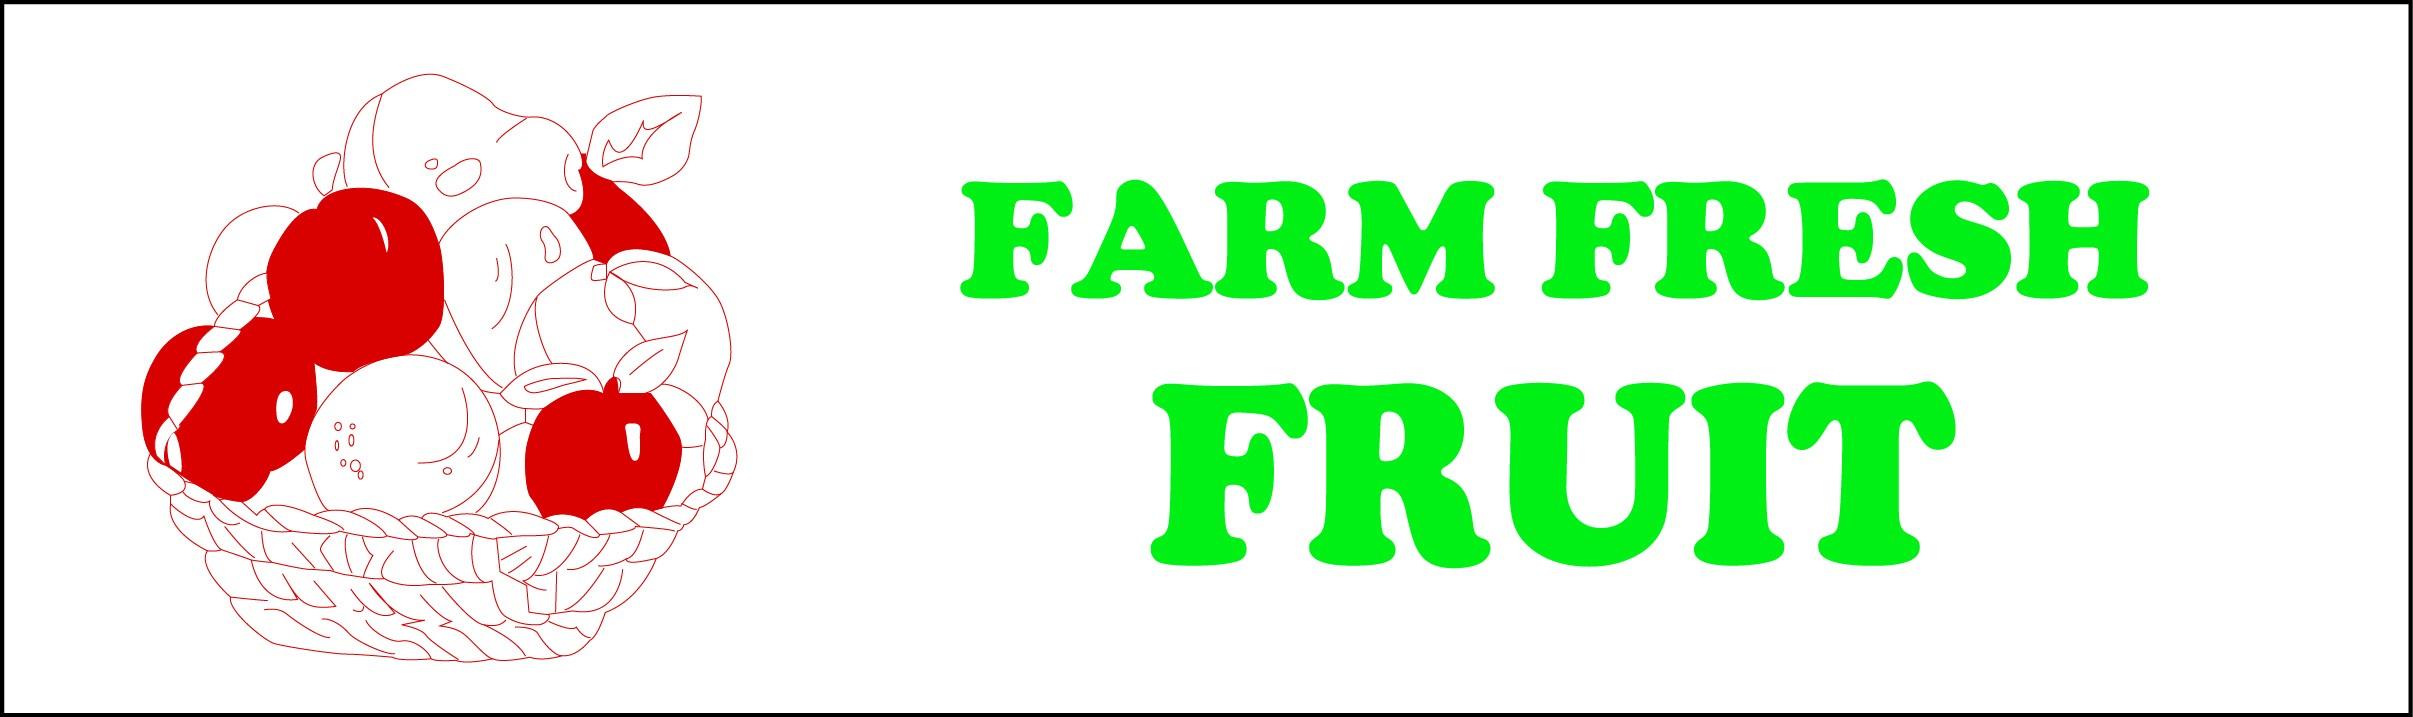 Banner ''Farm Fresh Fruit'' - 3' x 10'